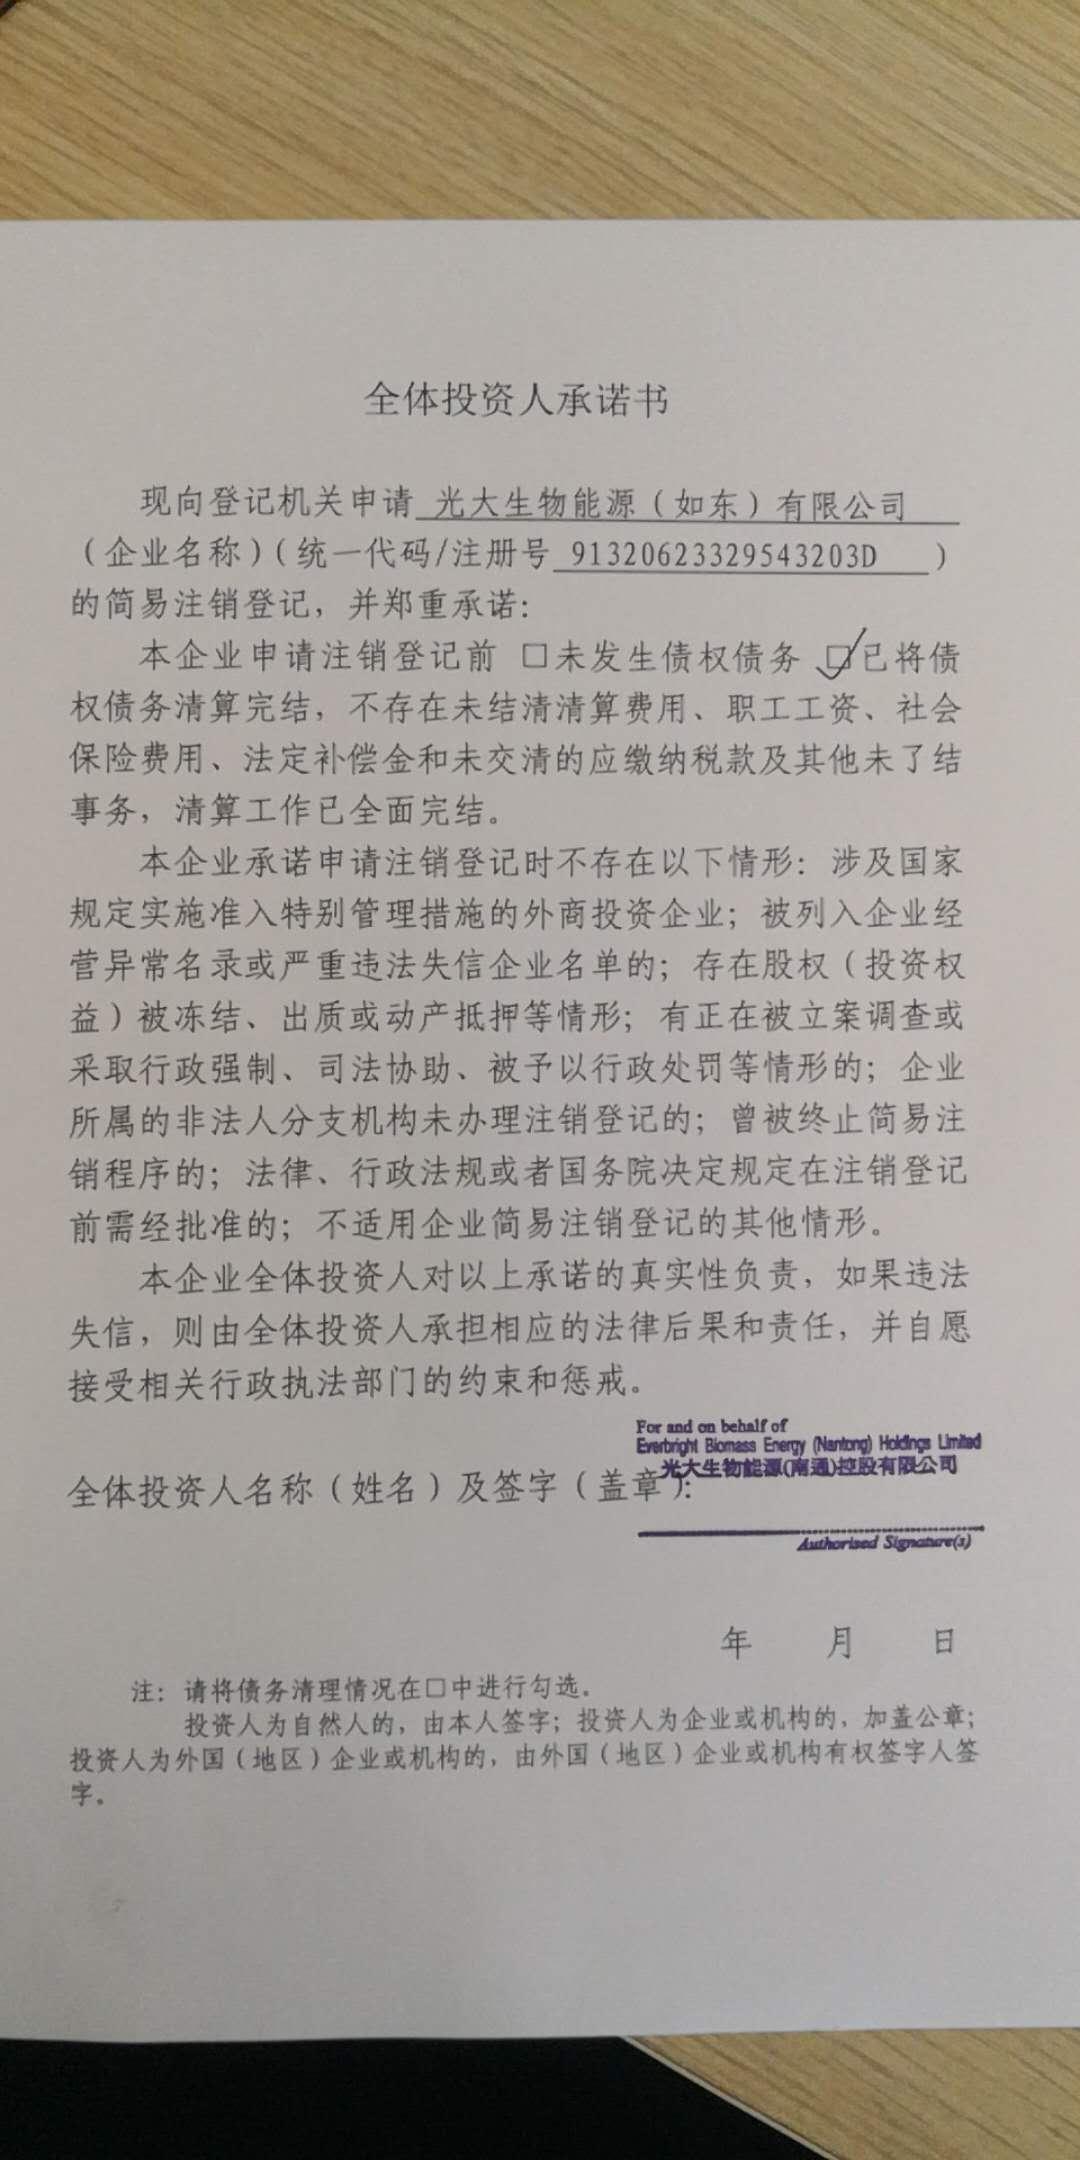 91320623329543203d 登记机关 如东县市场监督管理局 公告期 2018年08